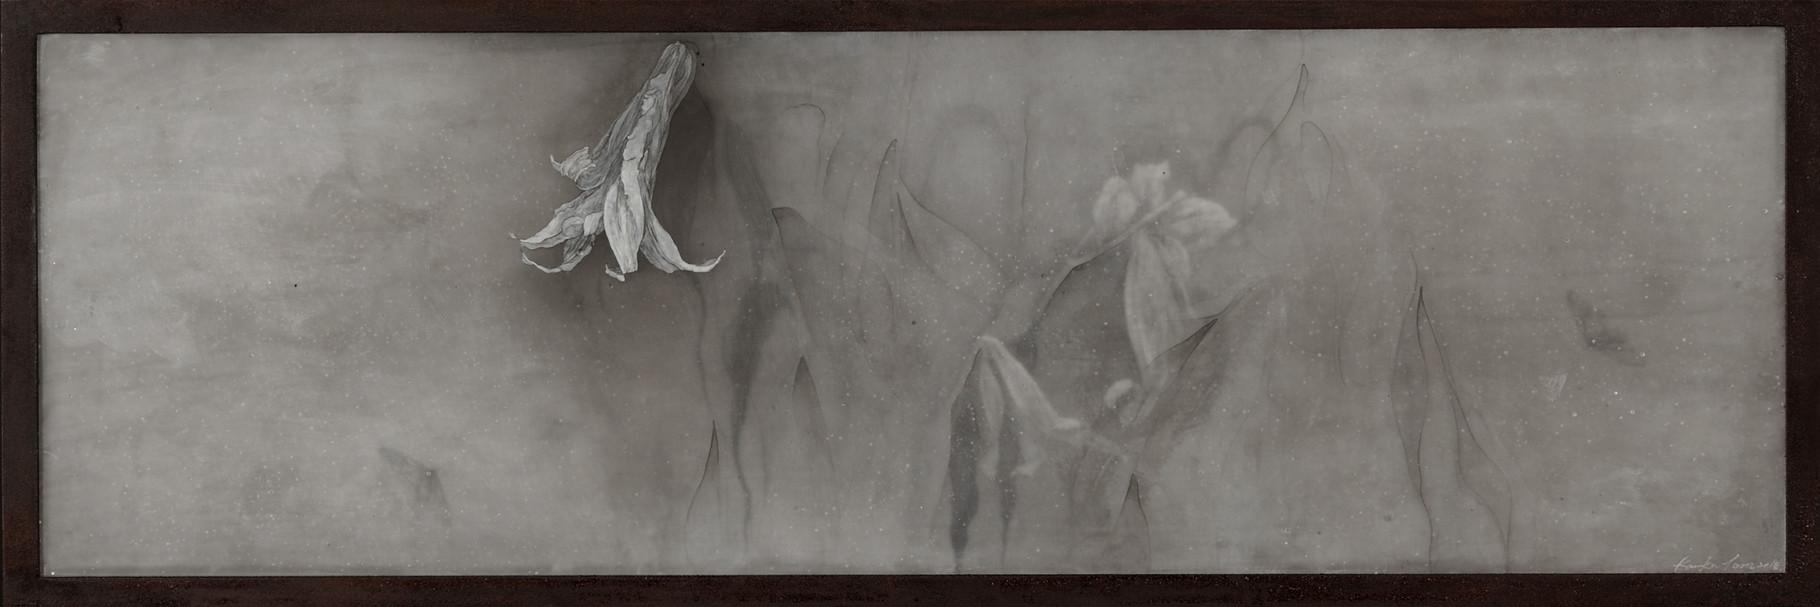 Predawn Stillness, 2014/ 34cm×99cm×5cm/ Kiln cast, Painted, Ink, Metal frame